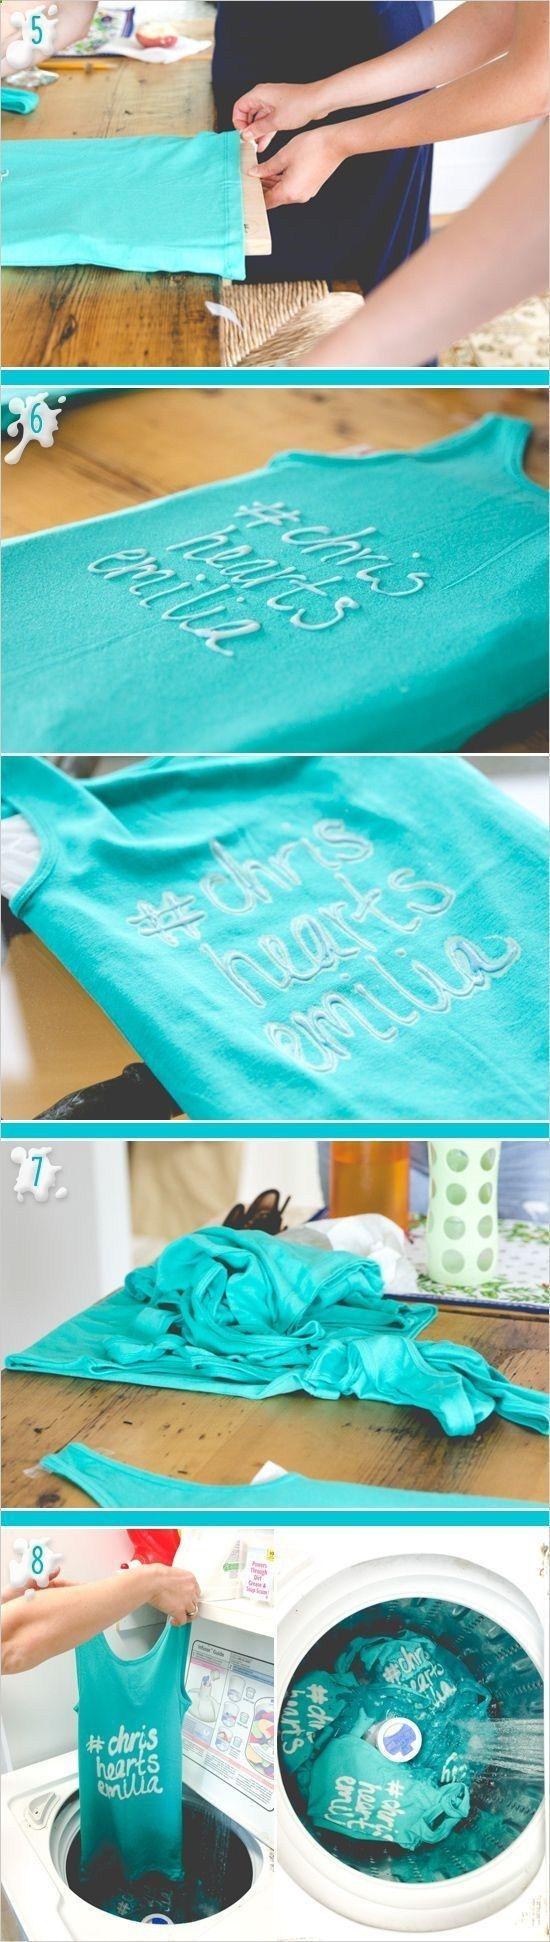 DIY Bleach Pen for Tees Tanks // terrific for family vacation shirts, team shirts, bridesmaids, etc. - Polka Pics: